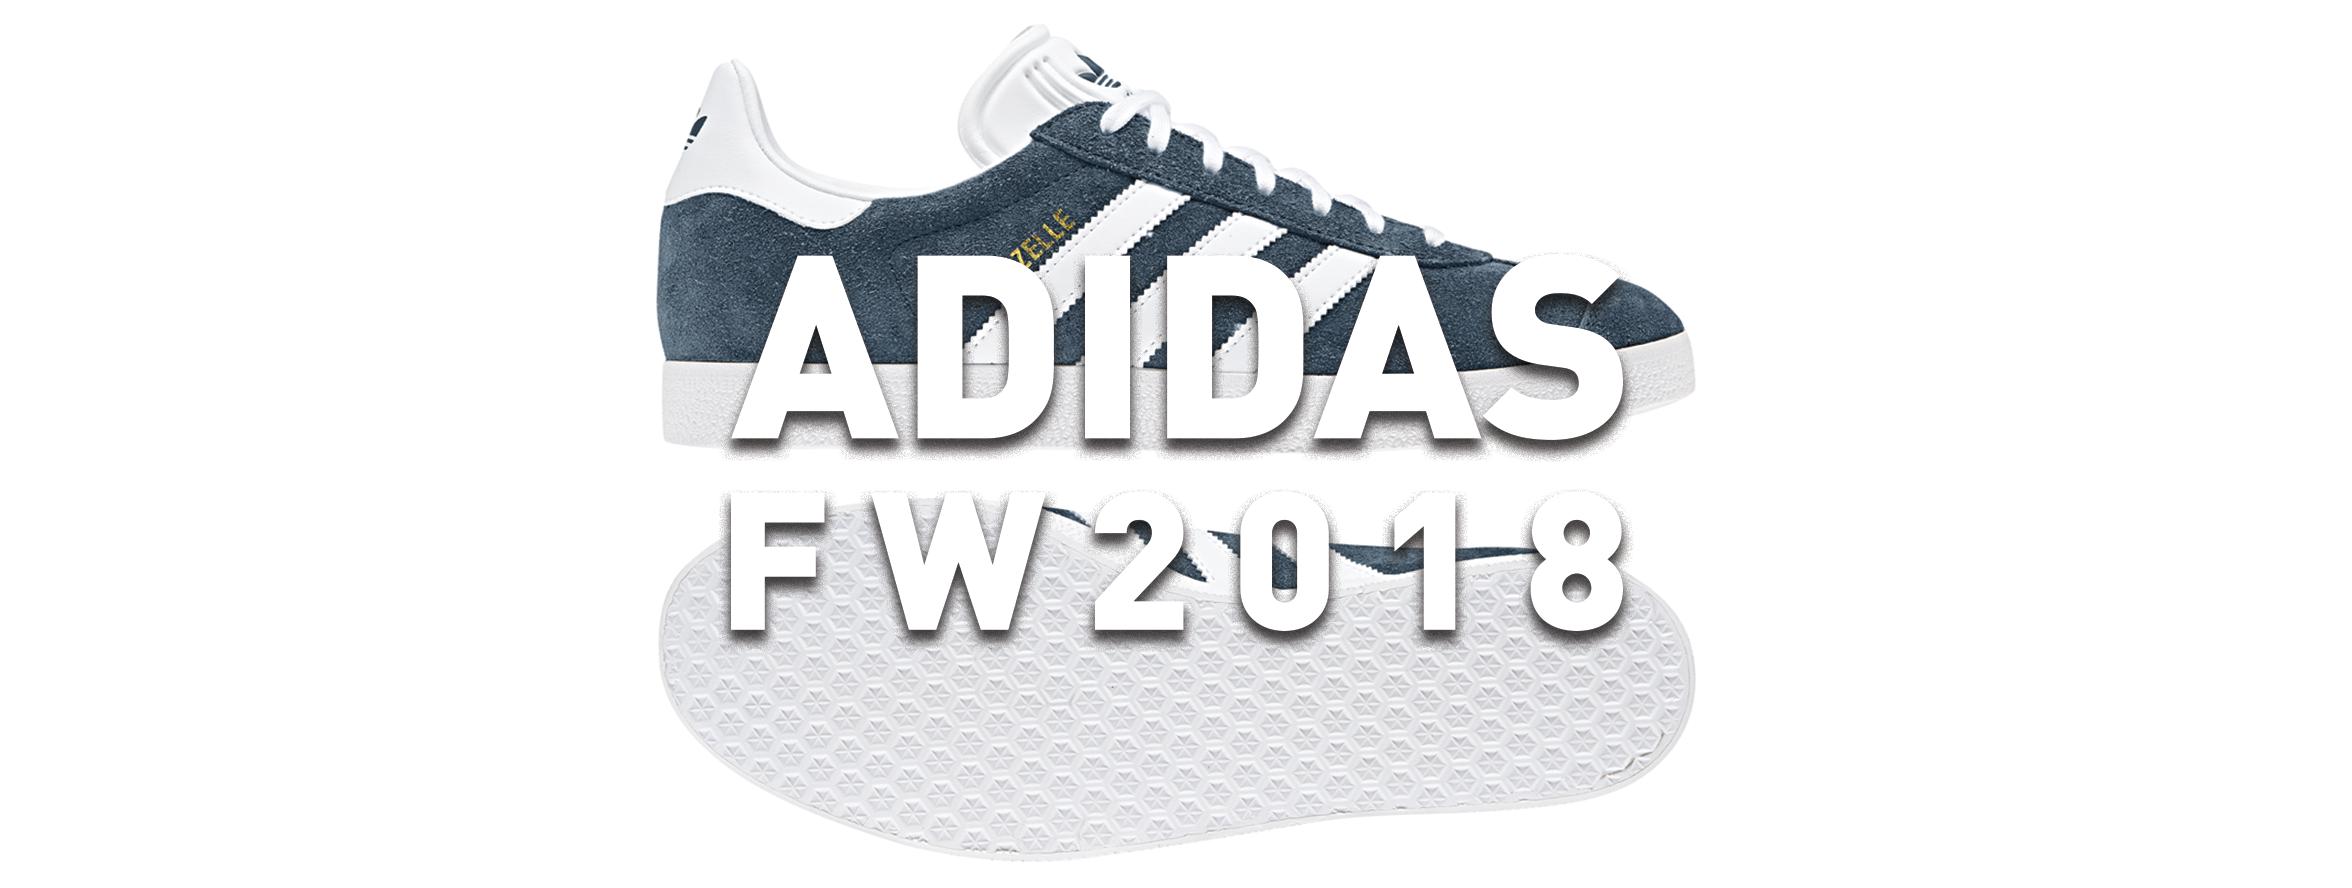 Notizie Moda Online — New post (Adidas Originals 2018 nuove